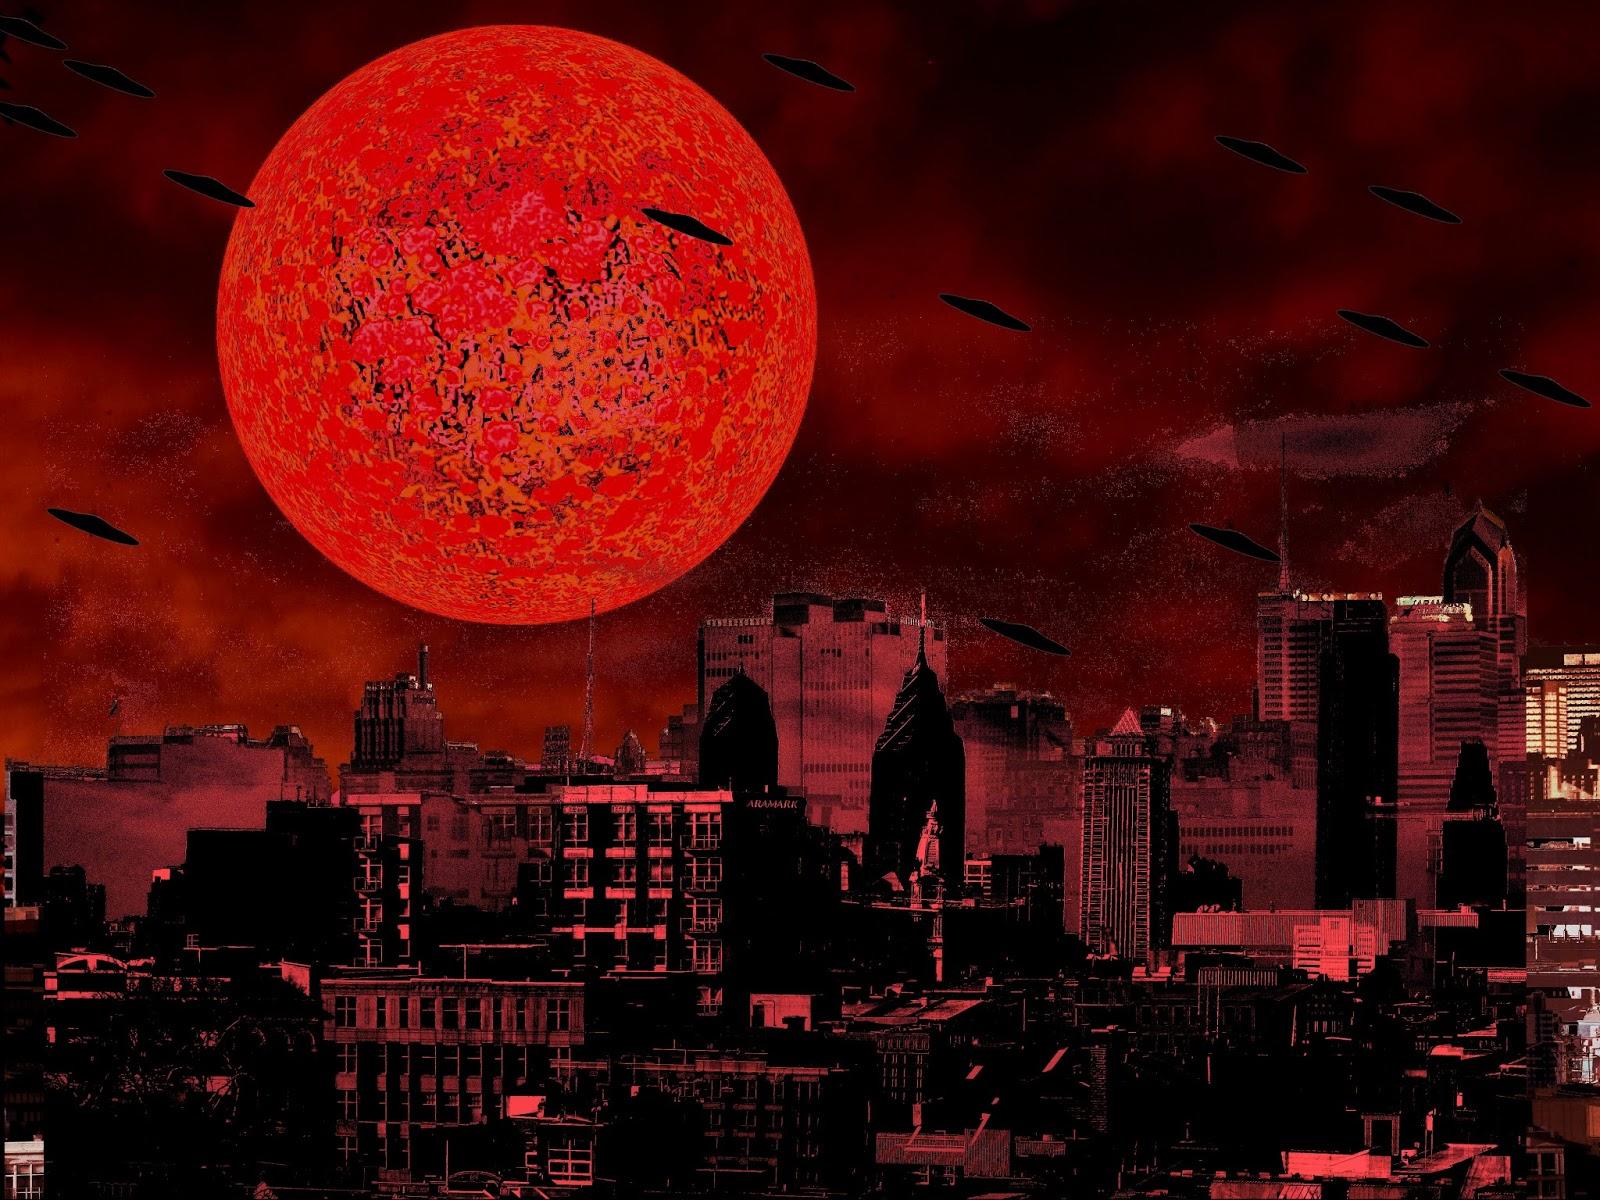 red cosmic moon year 2018 - photo #48